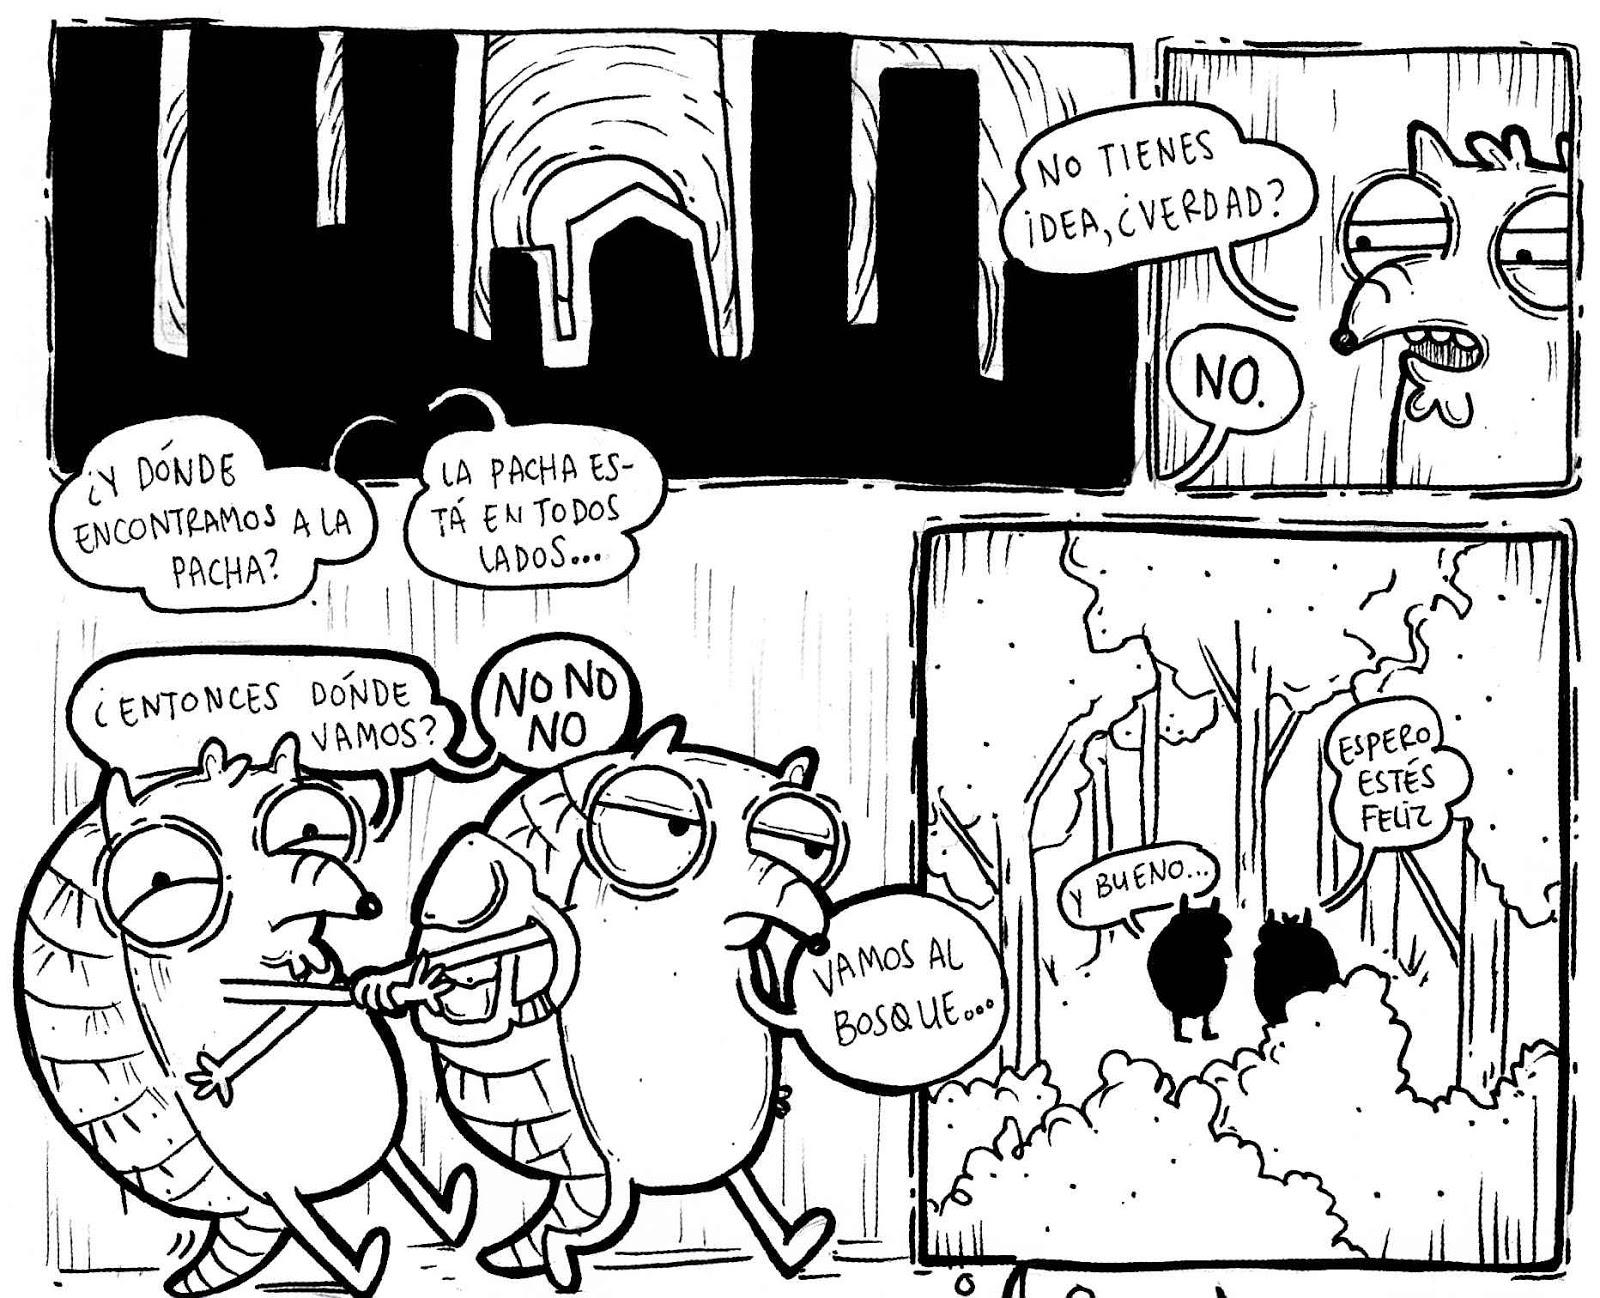 Comic Bolivia: Reseñas de comic boliviano (marzo 2016)